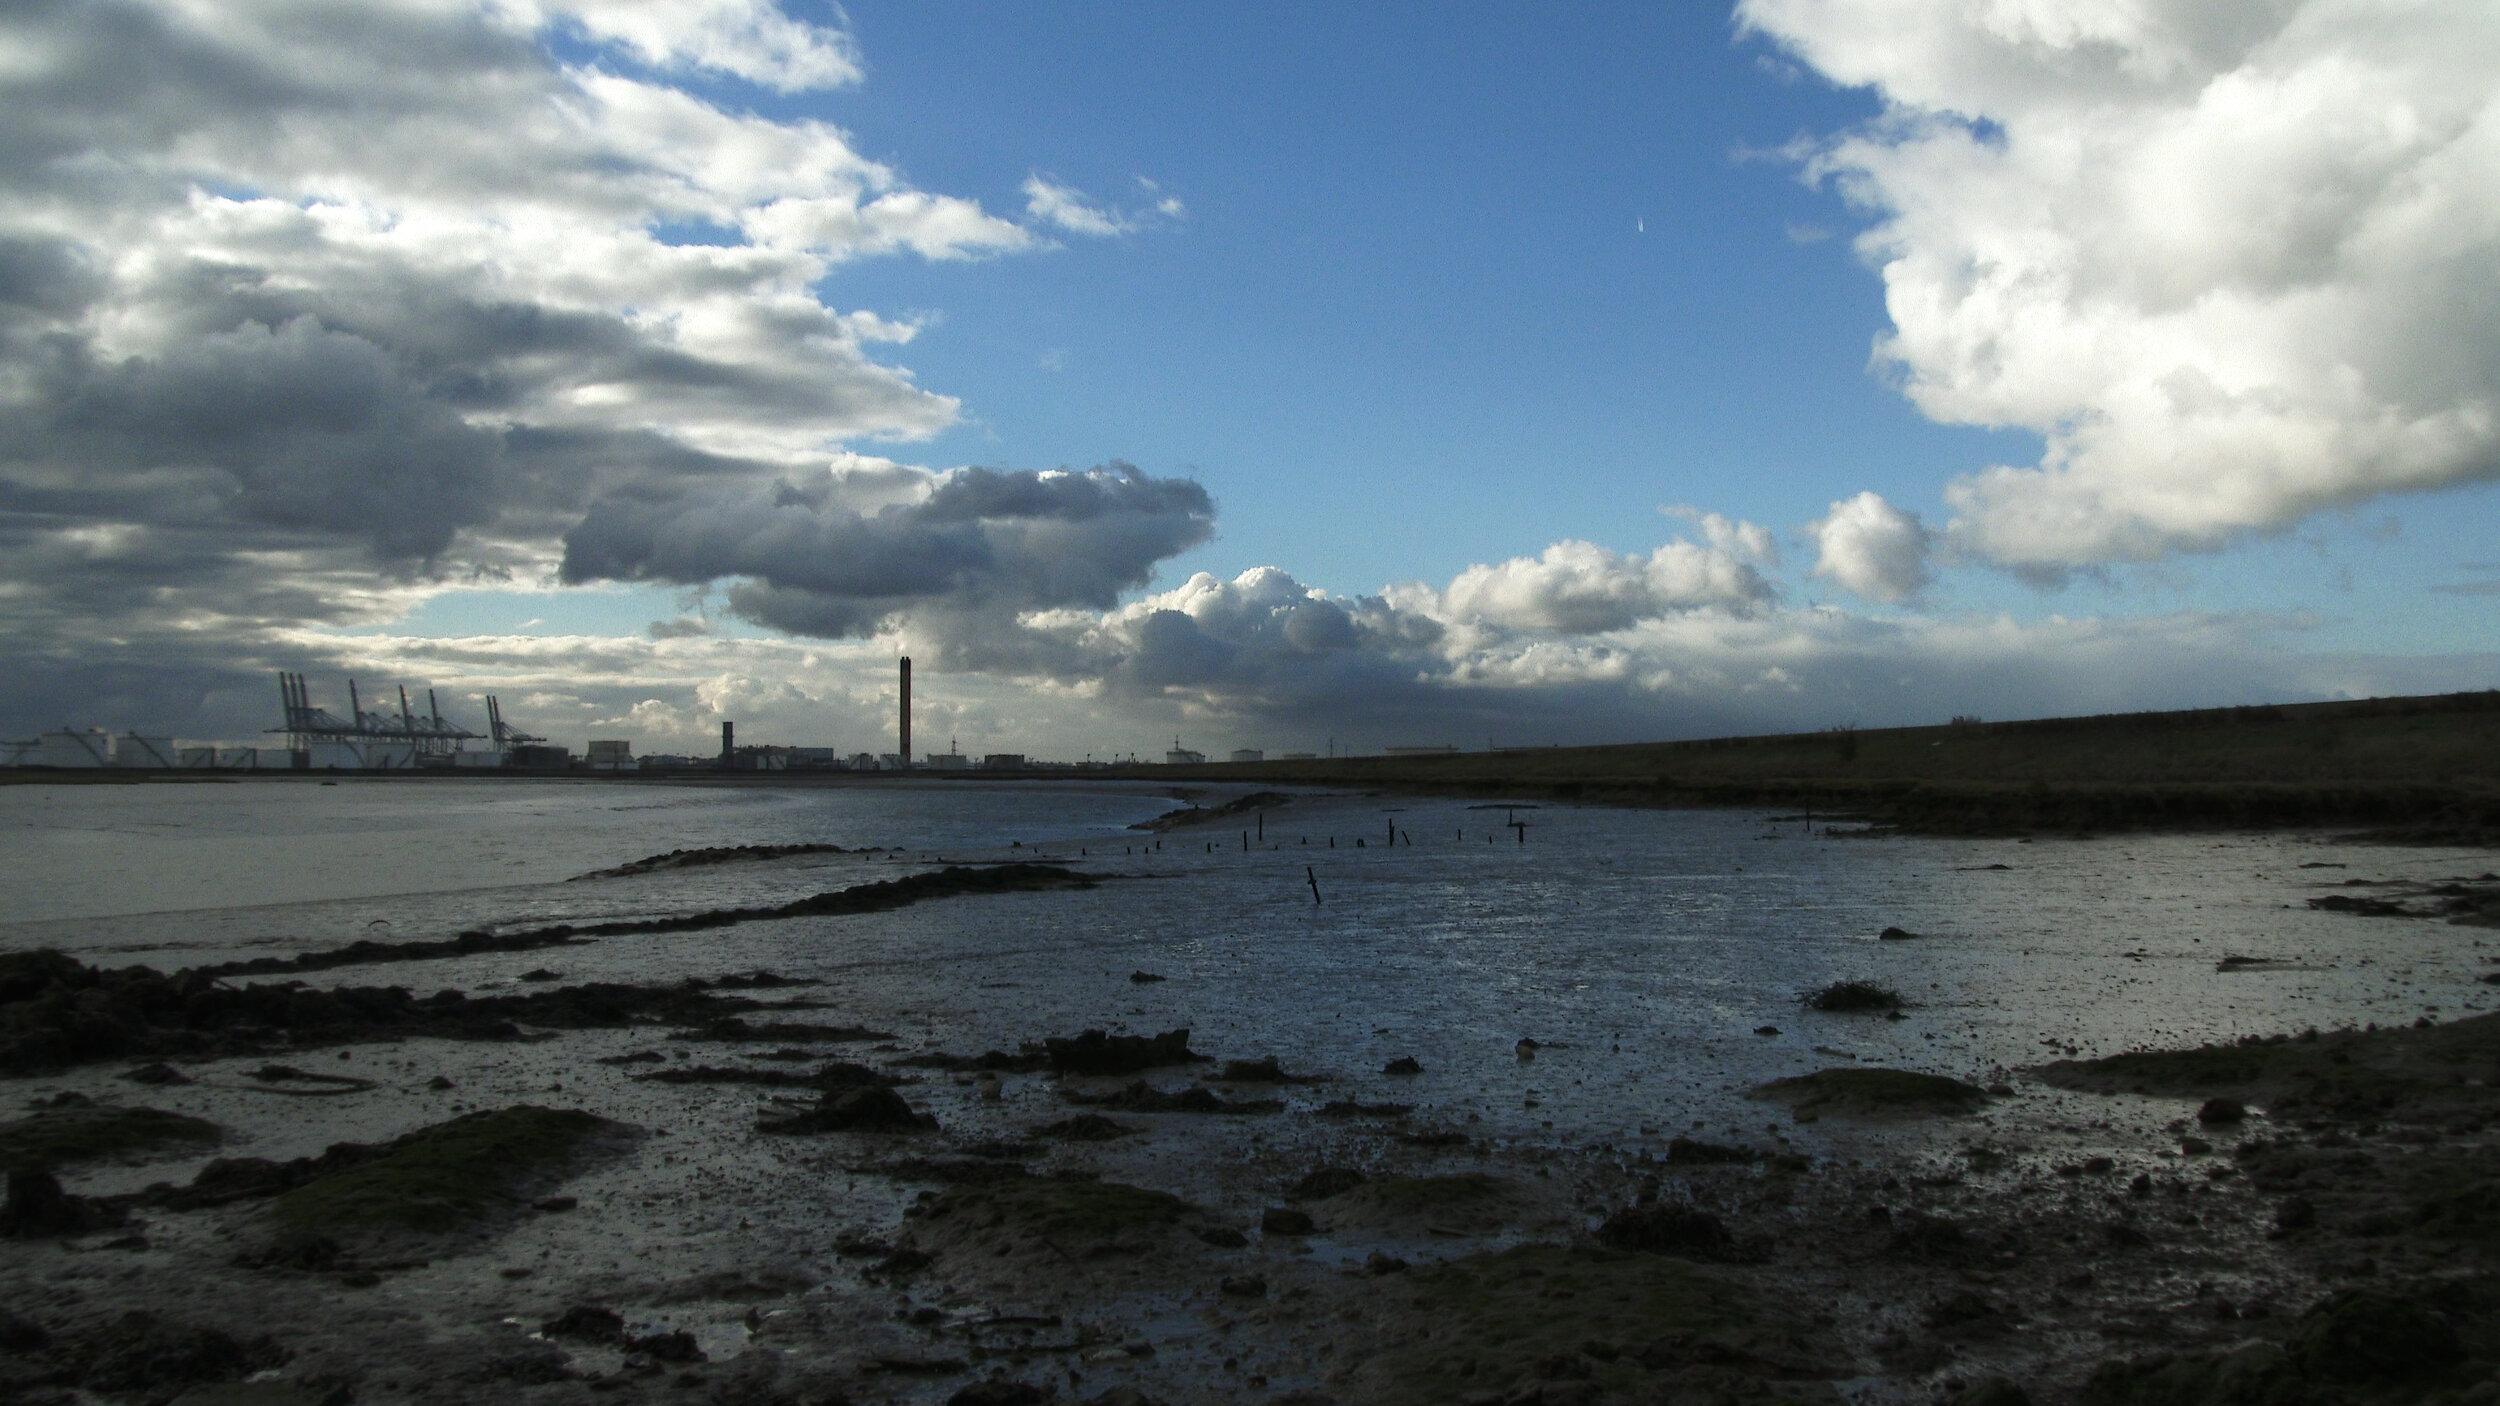 David+Blandy_The+World+After_2019_wetlands.jpg